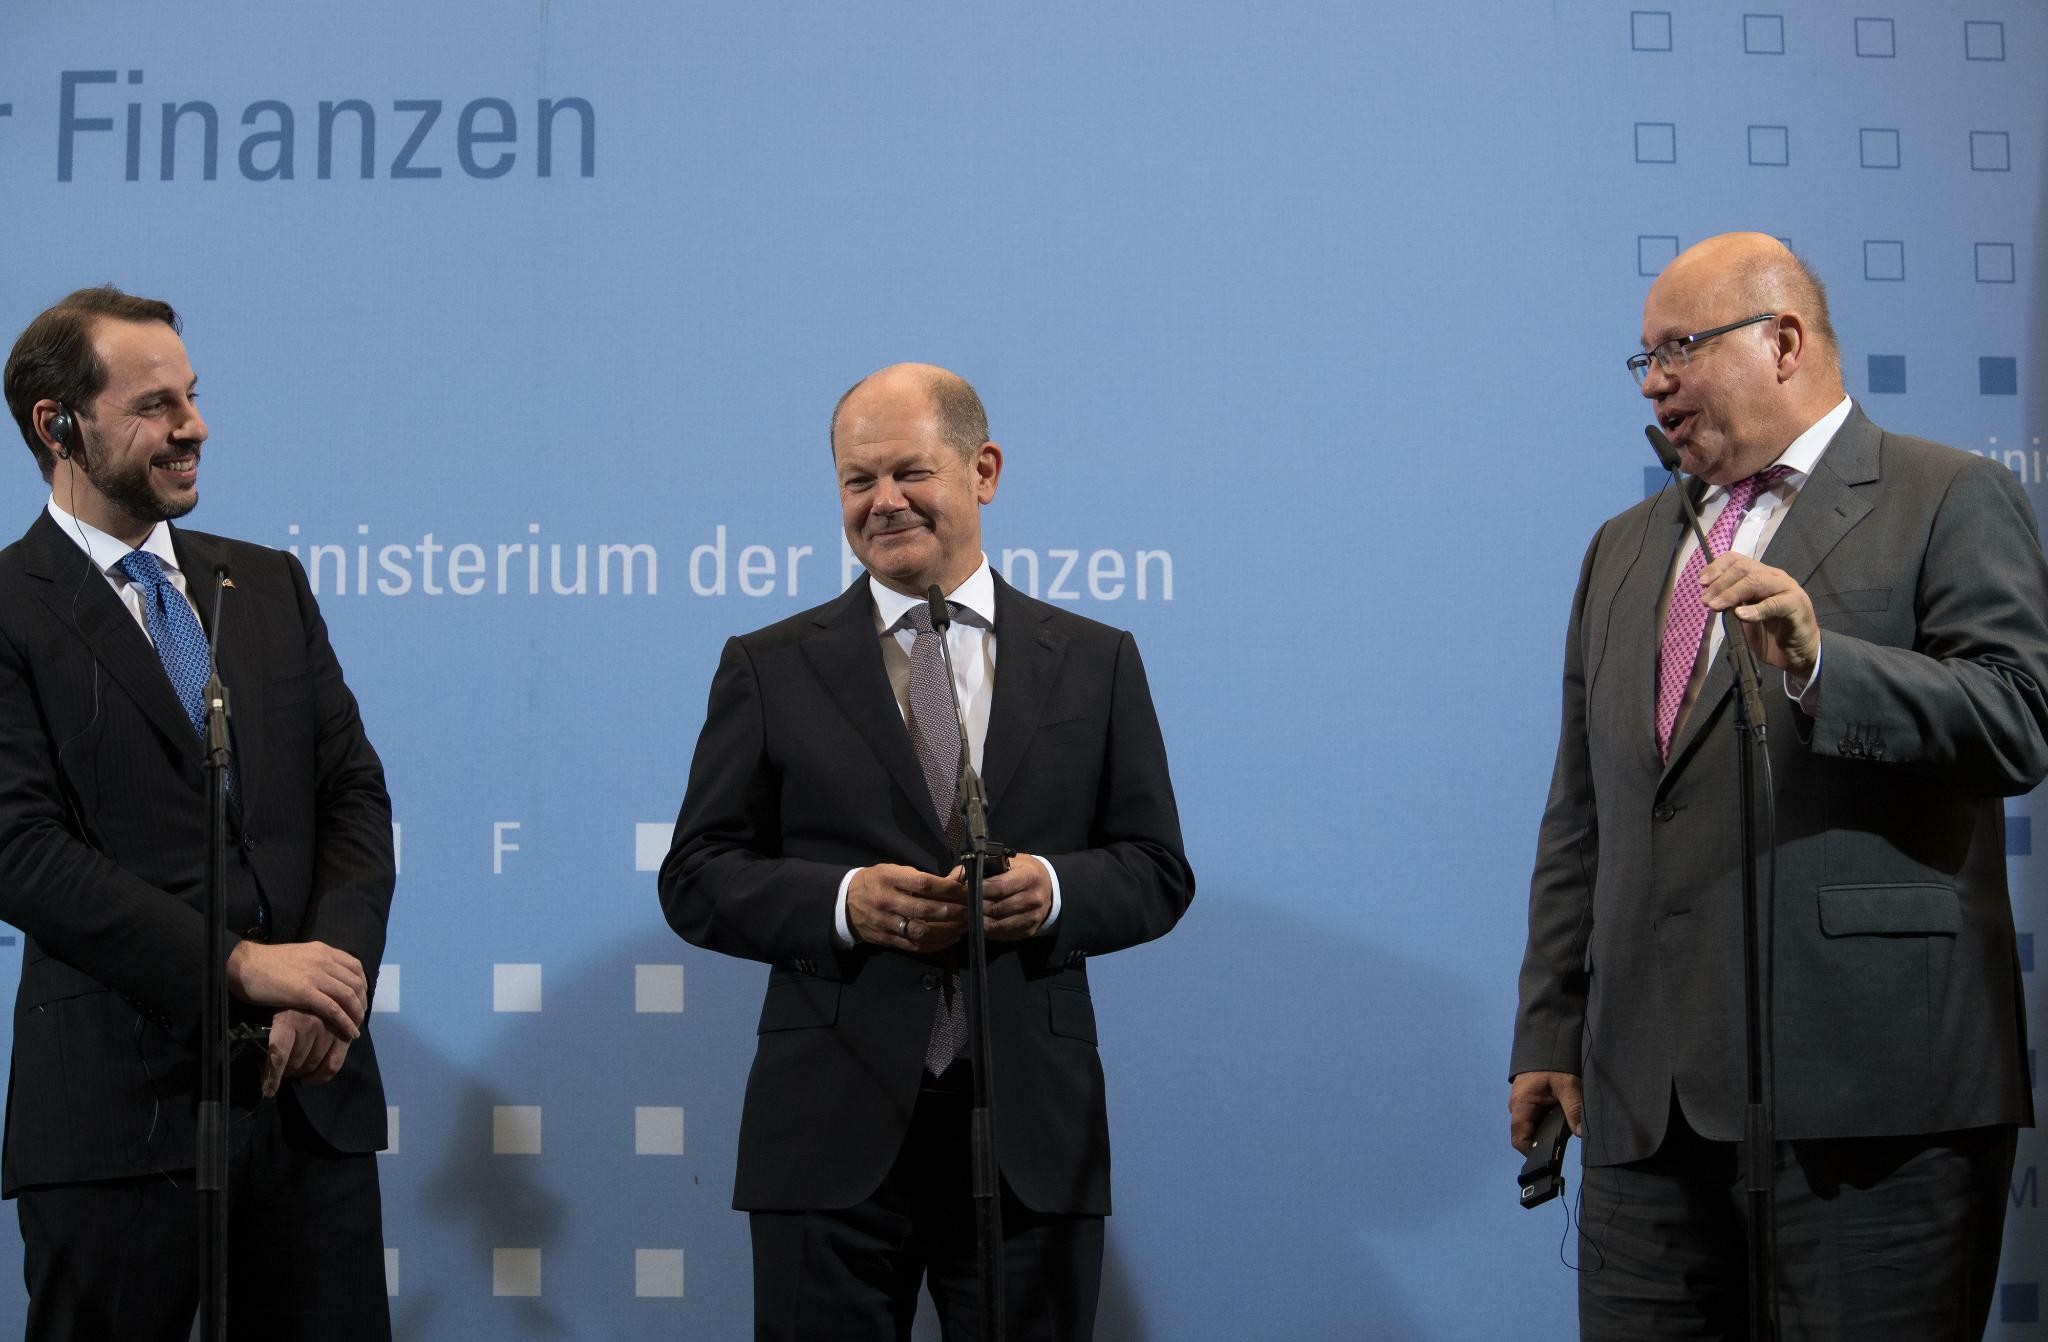 Finanzminister Scholz lehnt vollständige Abschaffung des Soli ab